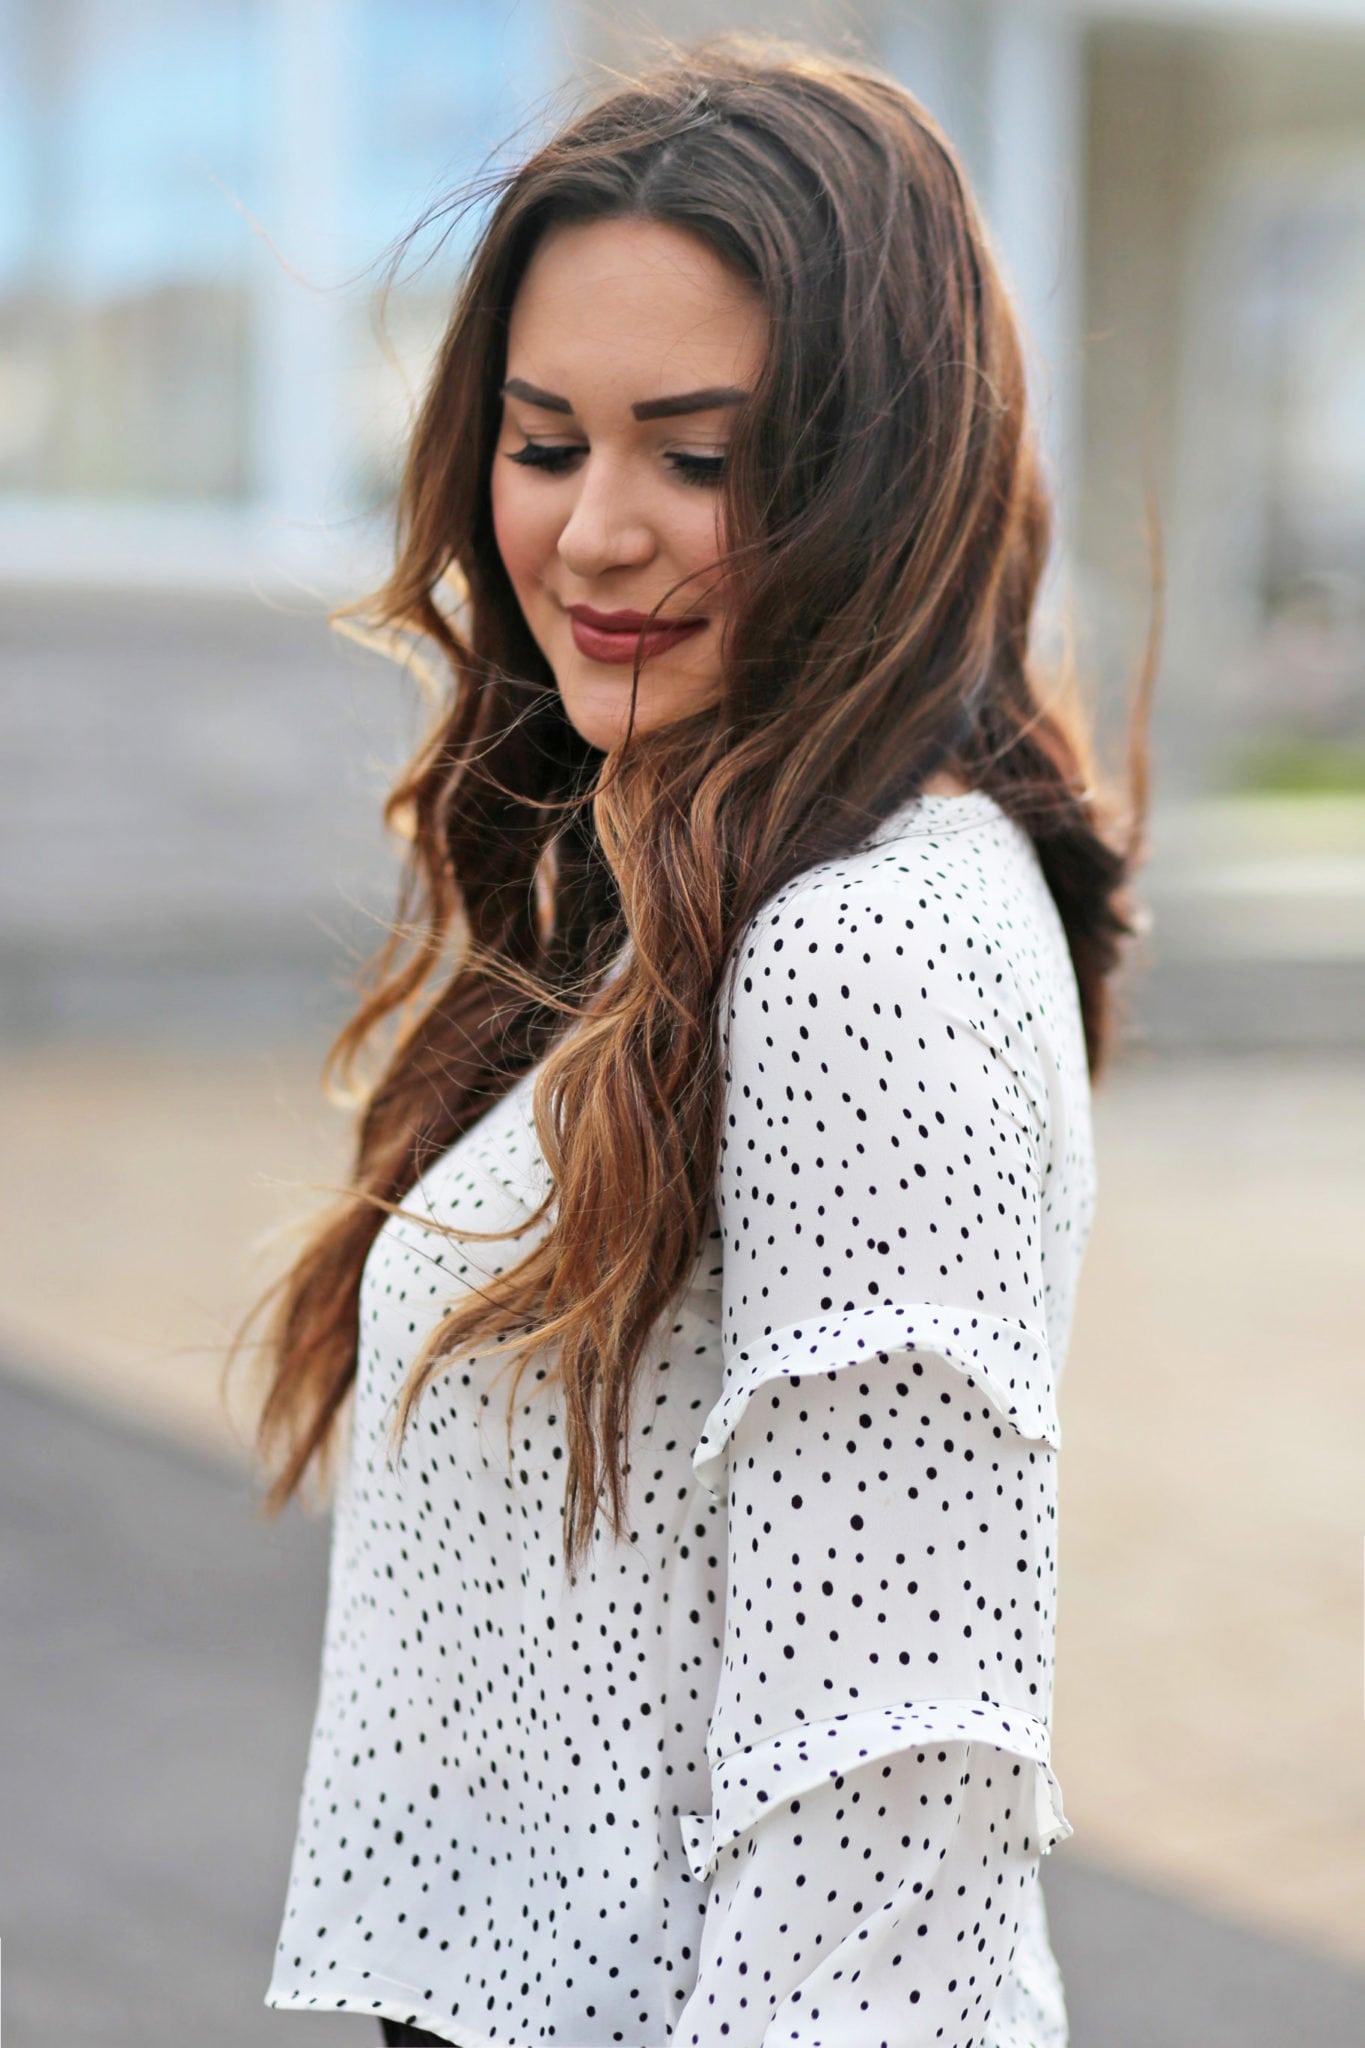 polka dots ruffles | white shirt outfit | beauty blogger Mash Elle | polka dots |